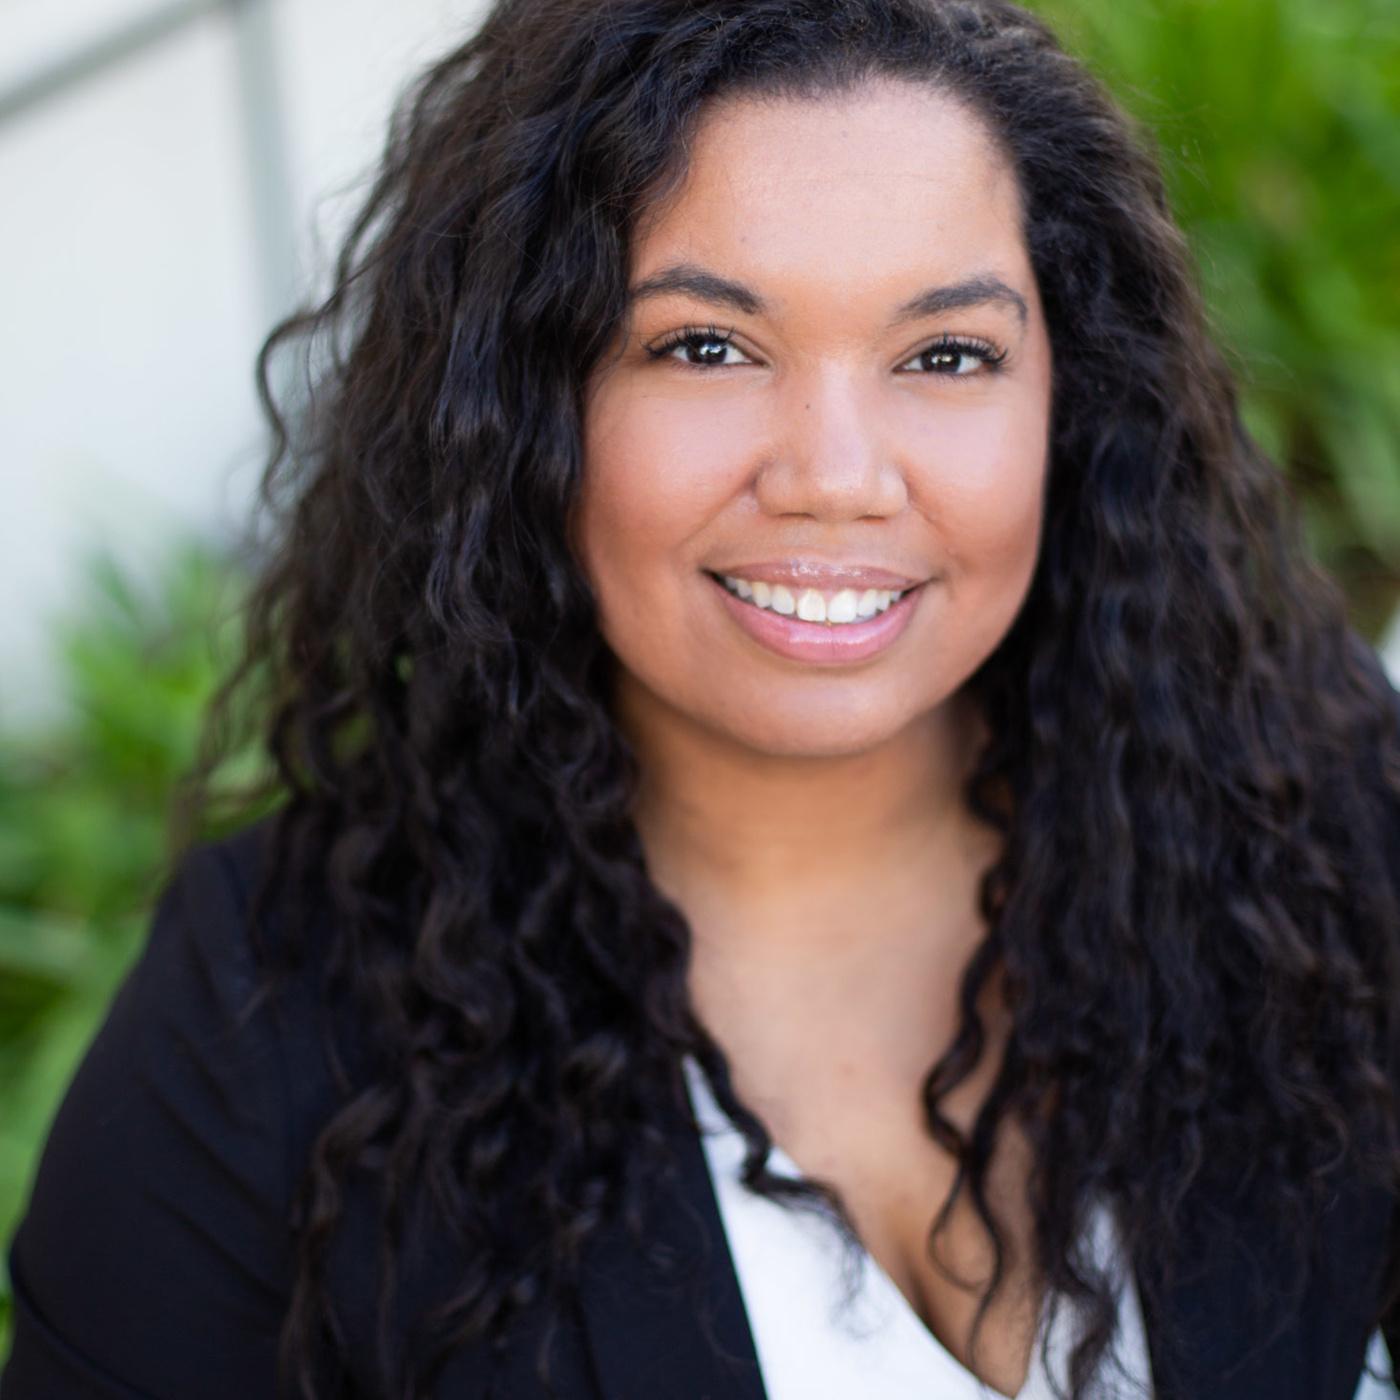 J Elle (@AuthorJ_Elle) - How To Become A Published Author